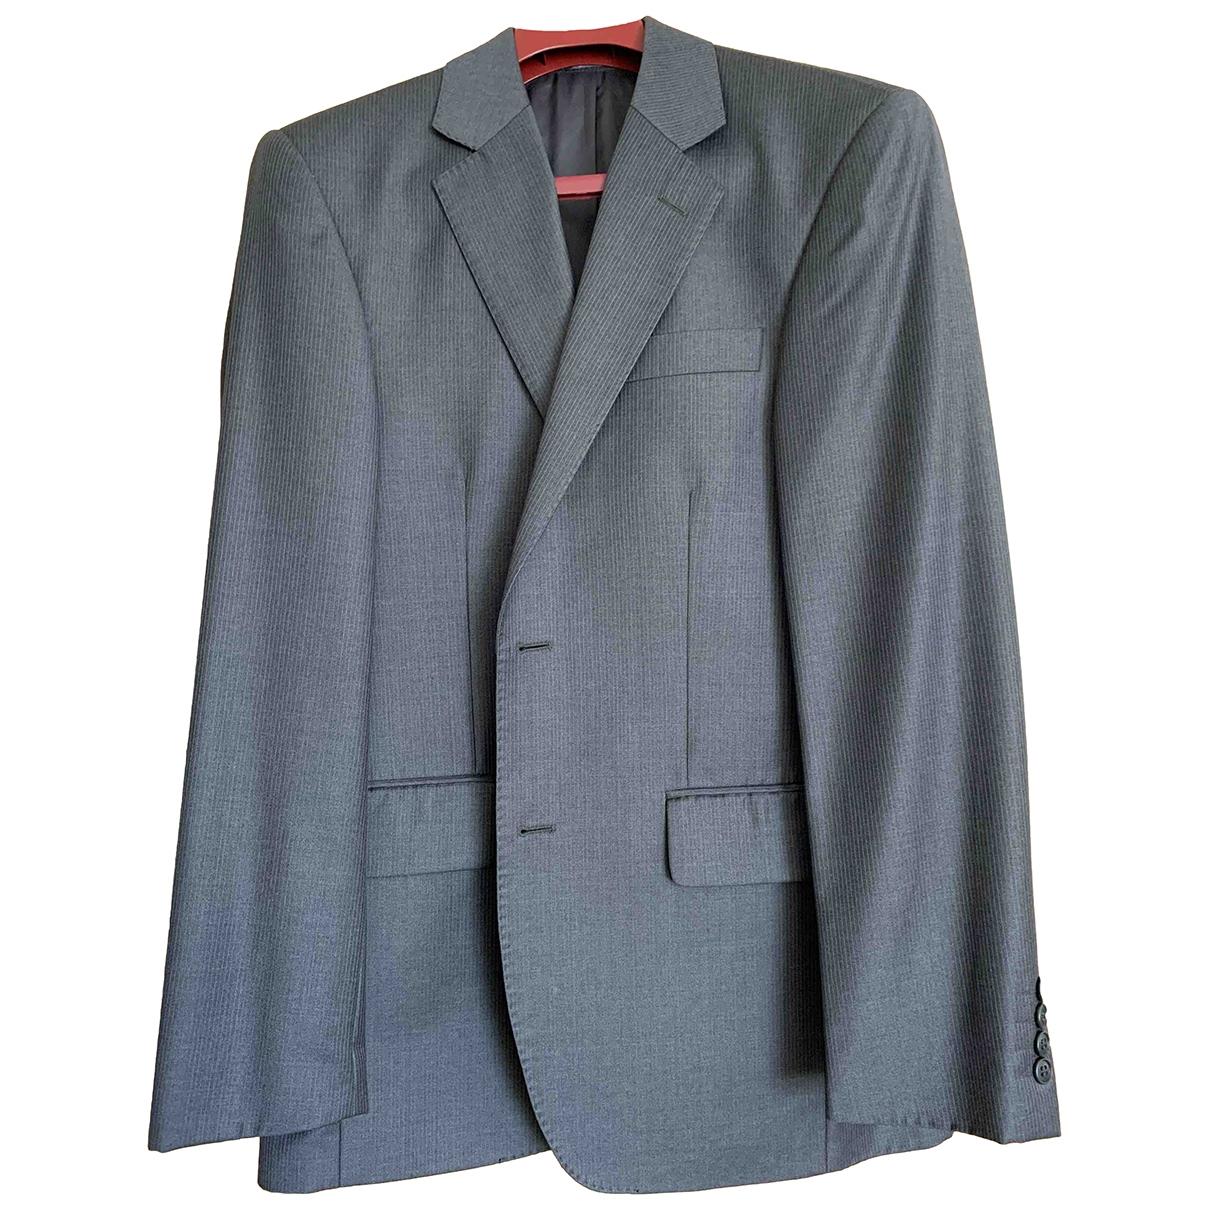 Ermenegildo Zegna \N Anthracite Wool Suits for Men 38 UK - US